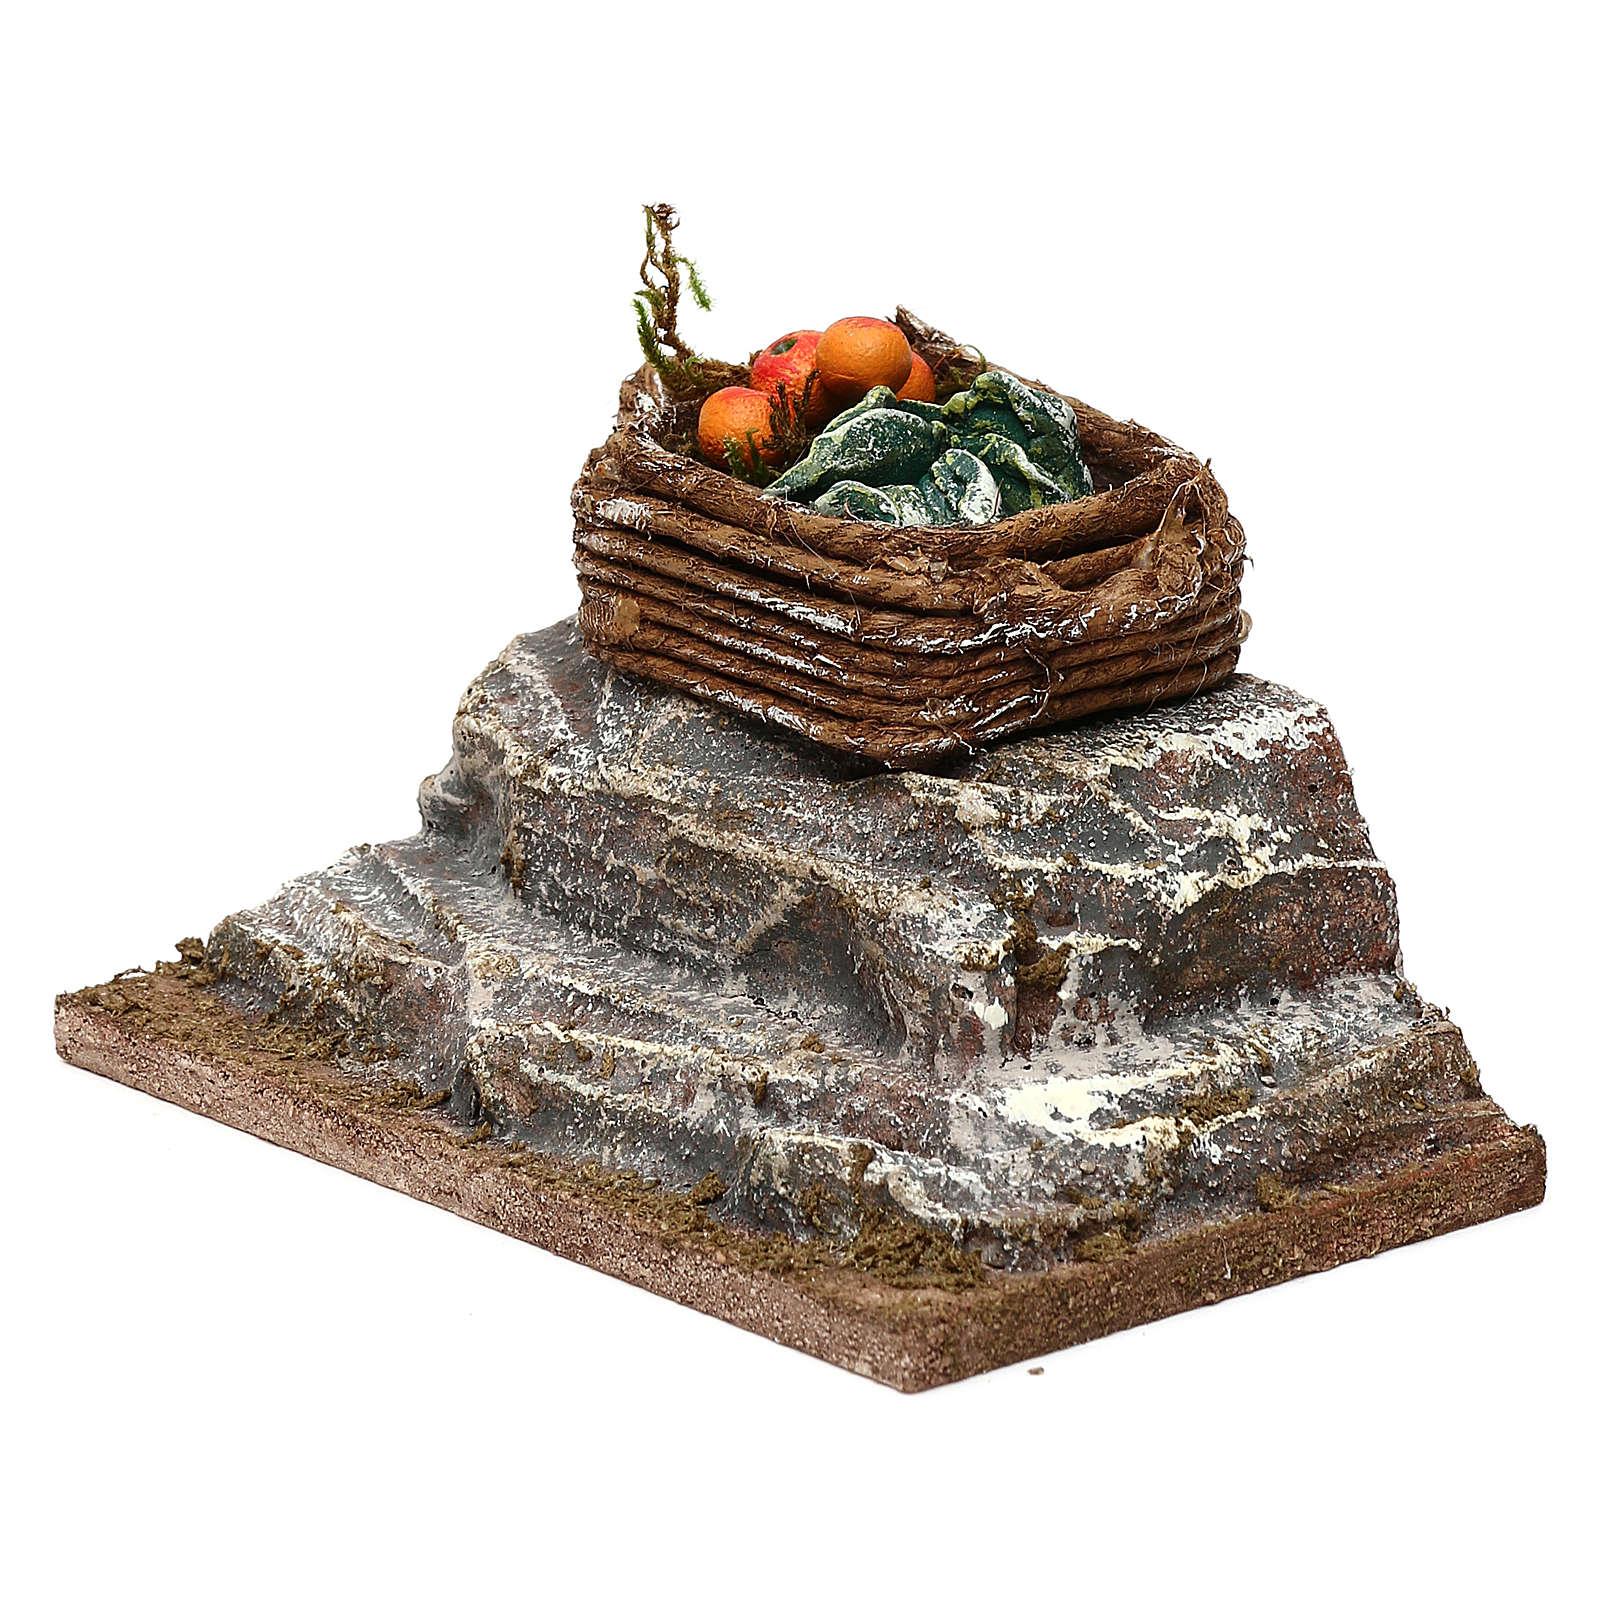 Cassetta su roccia presepe 10 cm ambientazione 5x10x5 cm 4